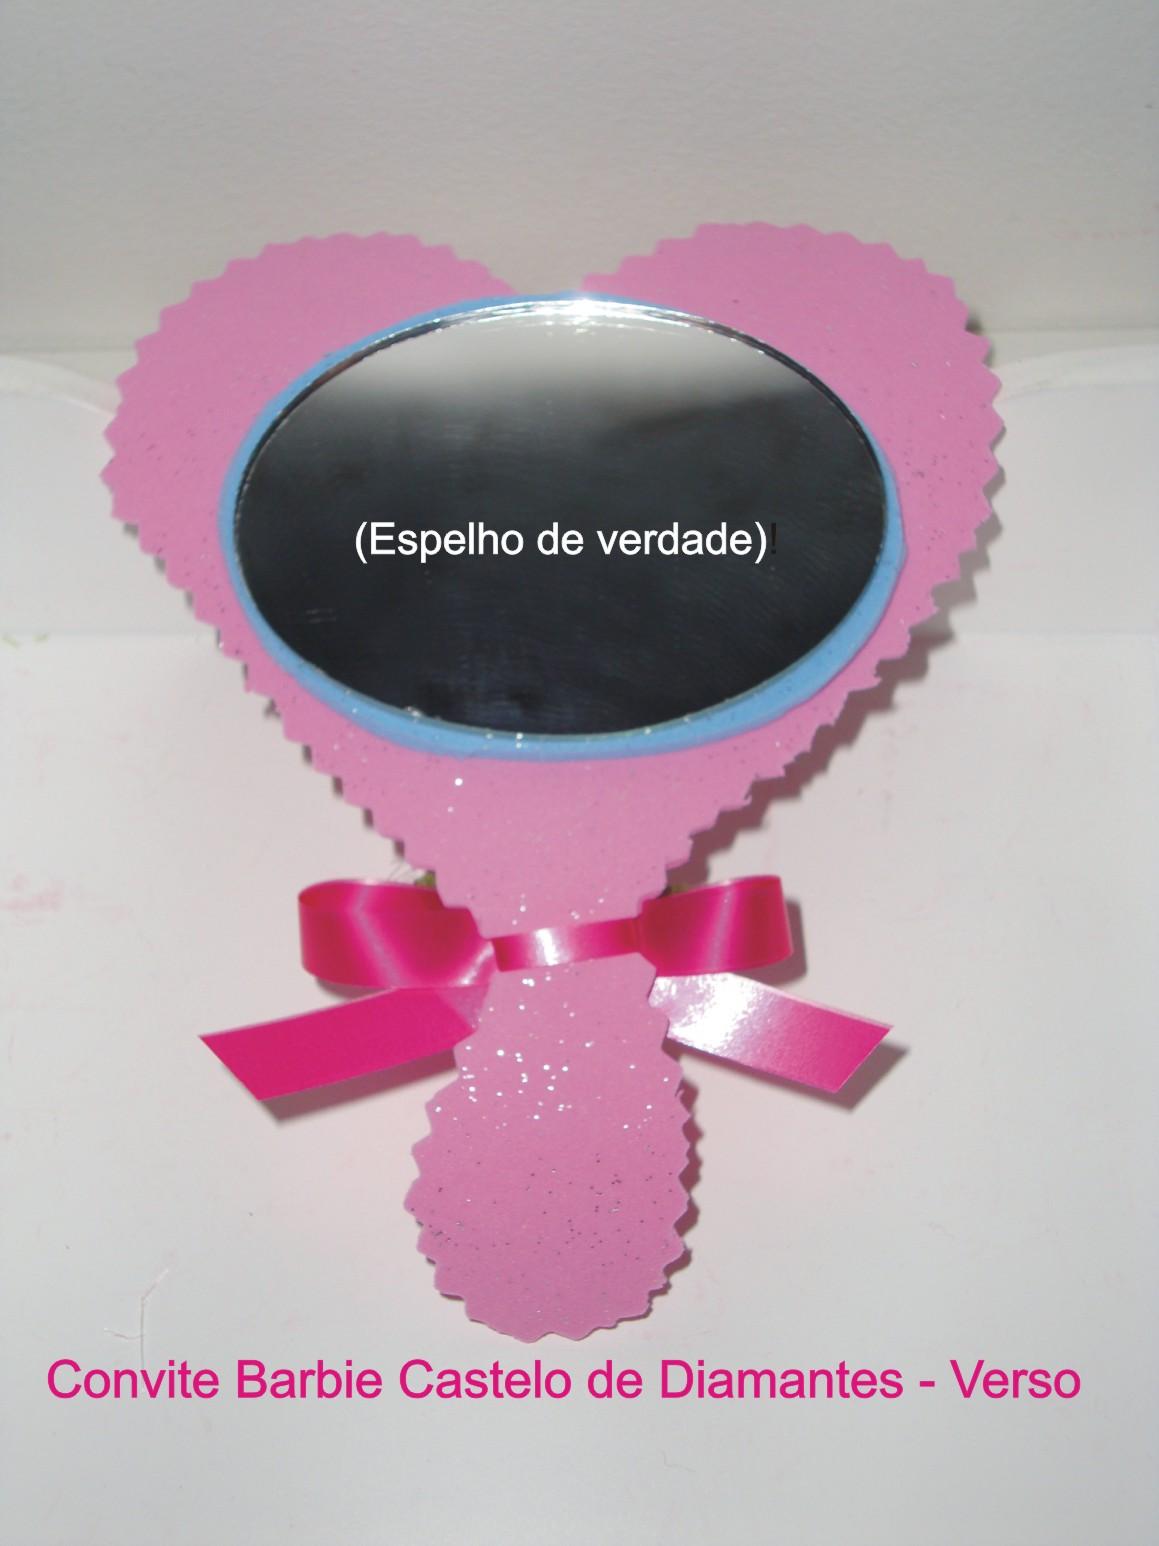 Convite Barbie Castelo De Diamantes